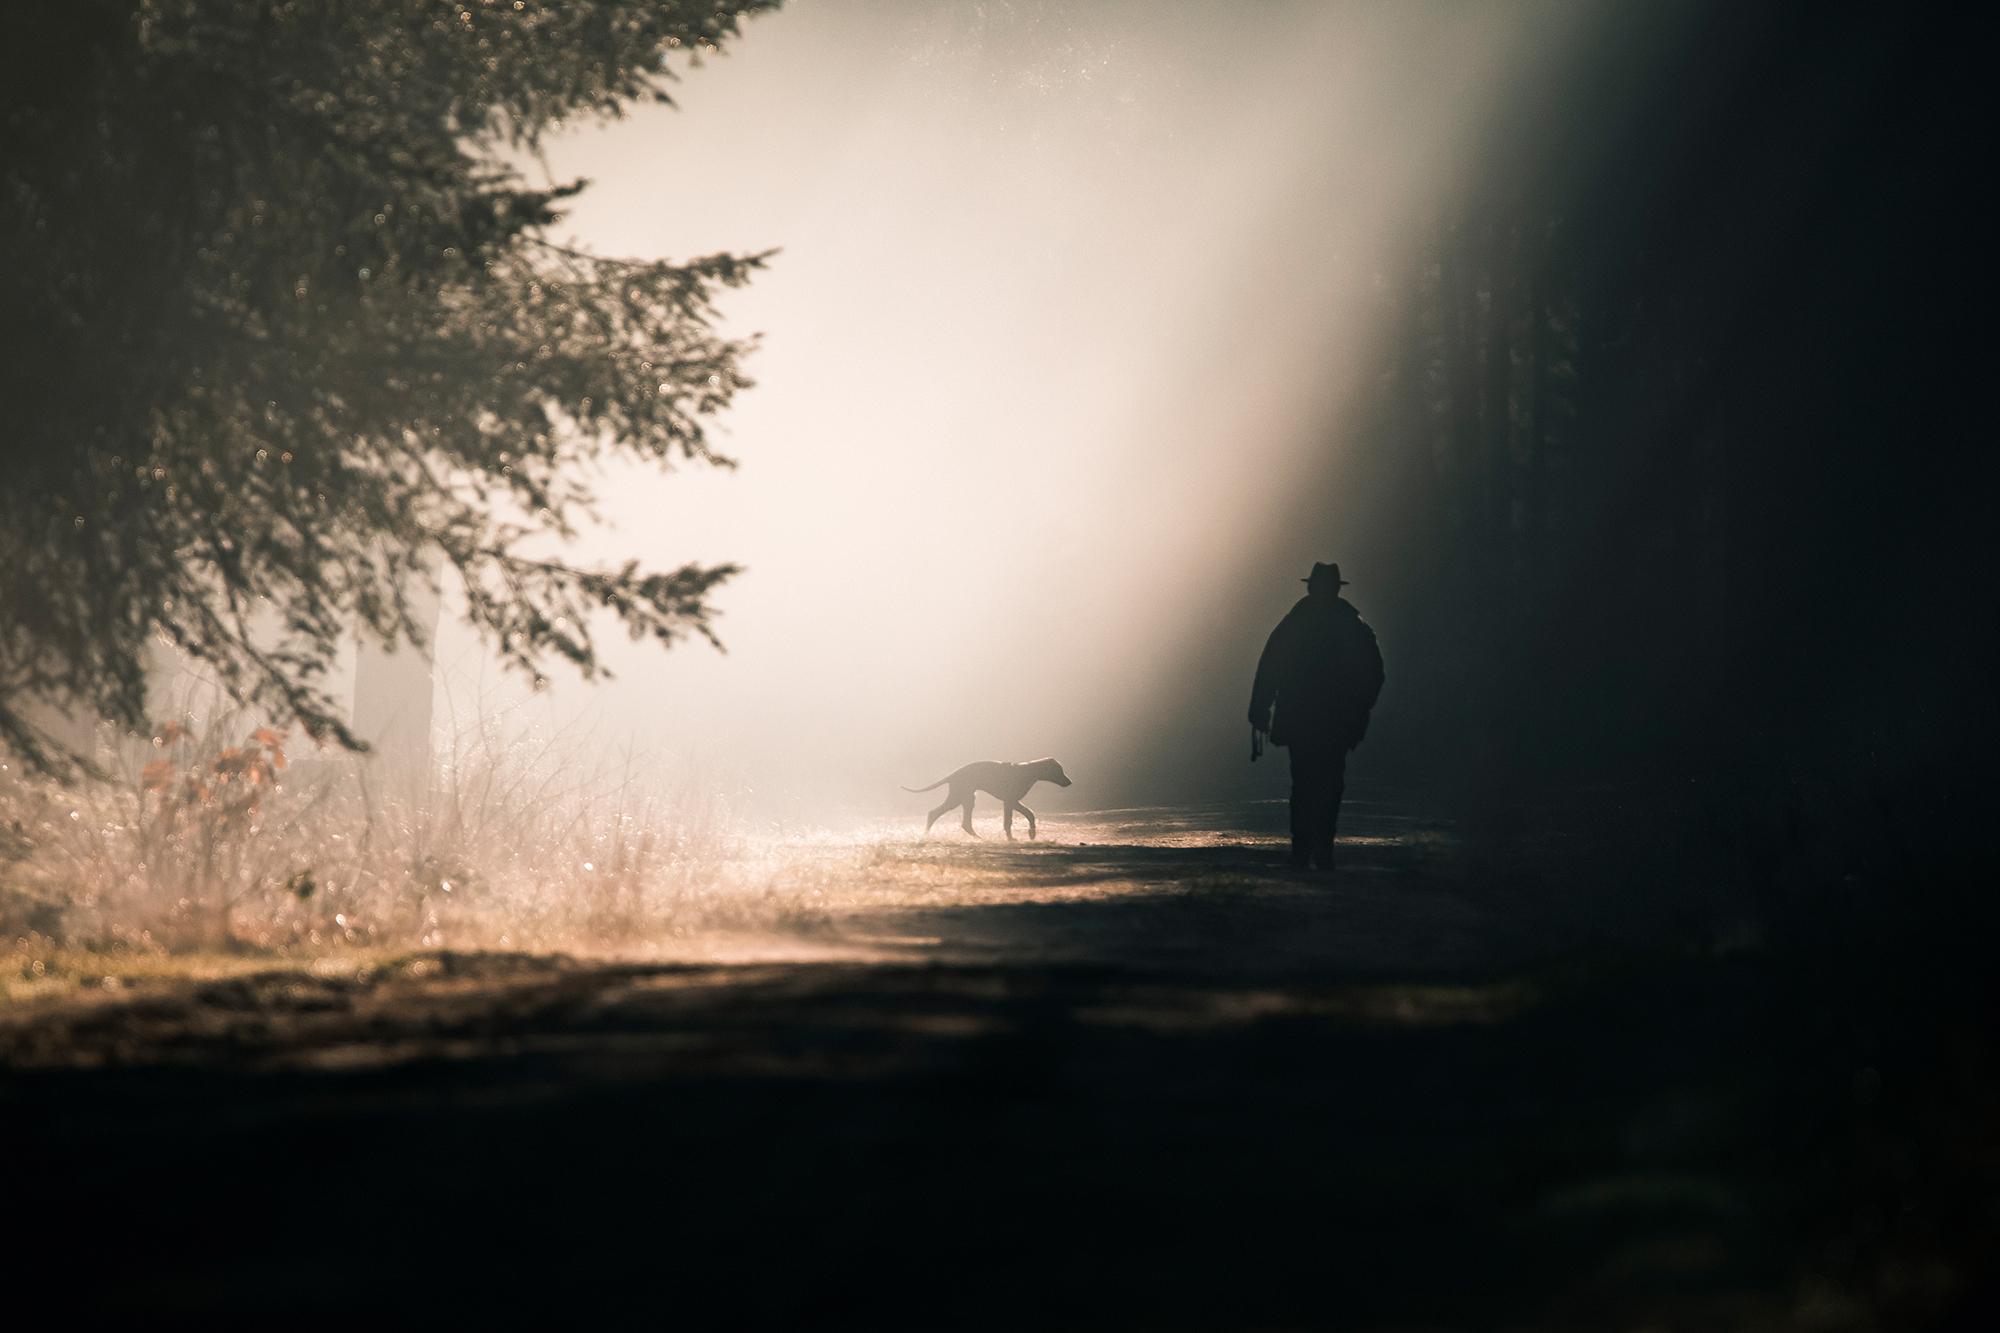 Kelly_Noten_Tom_Thiemann_Mystical_Forest_1